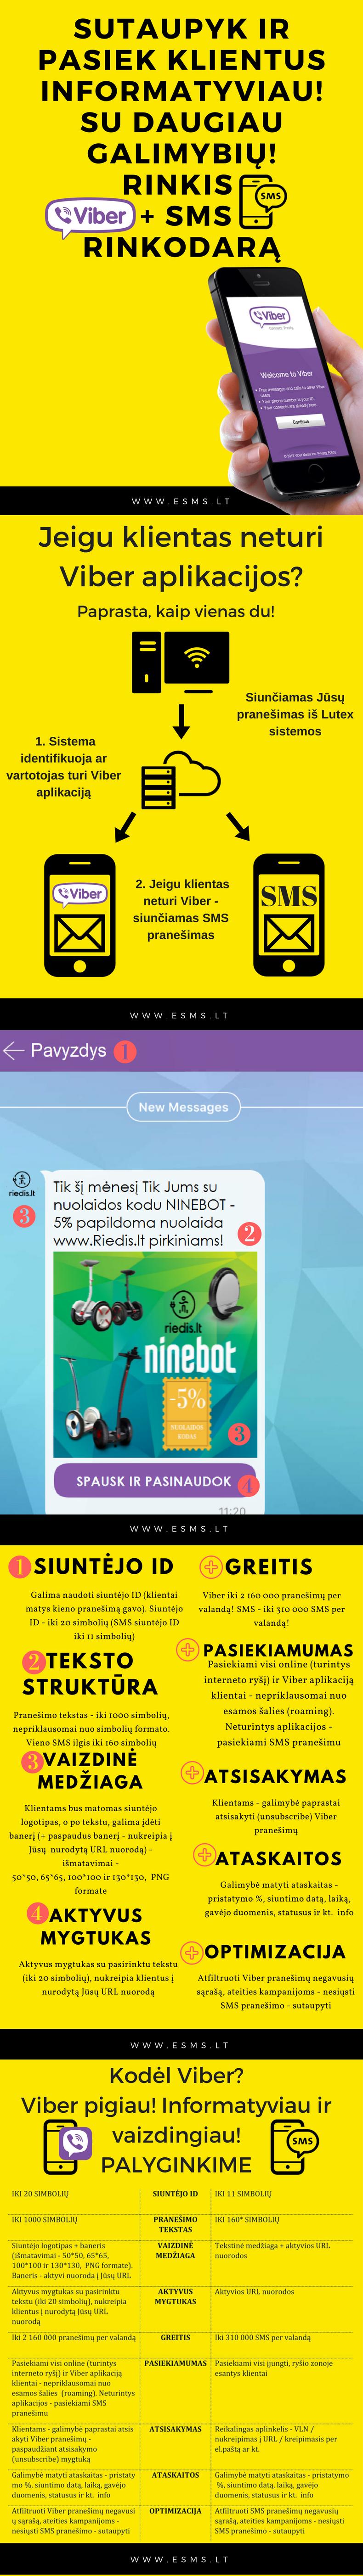 Viber SMS rinkodara